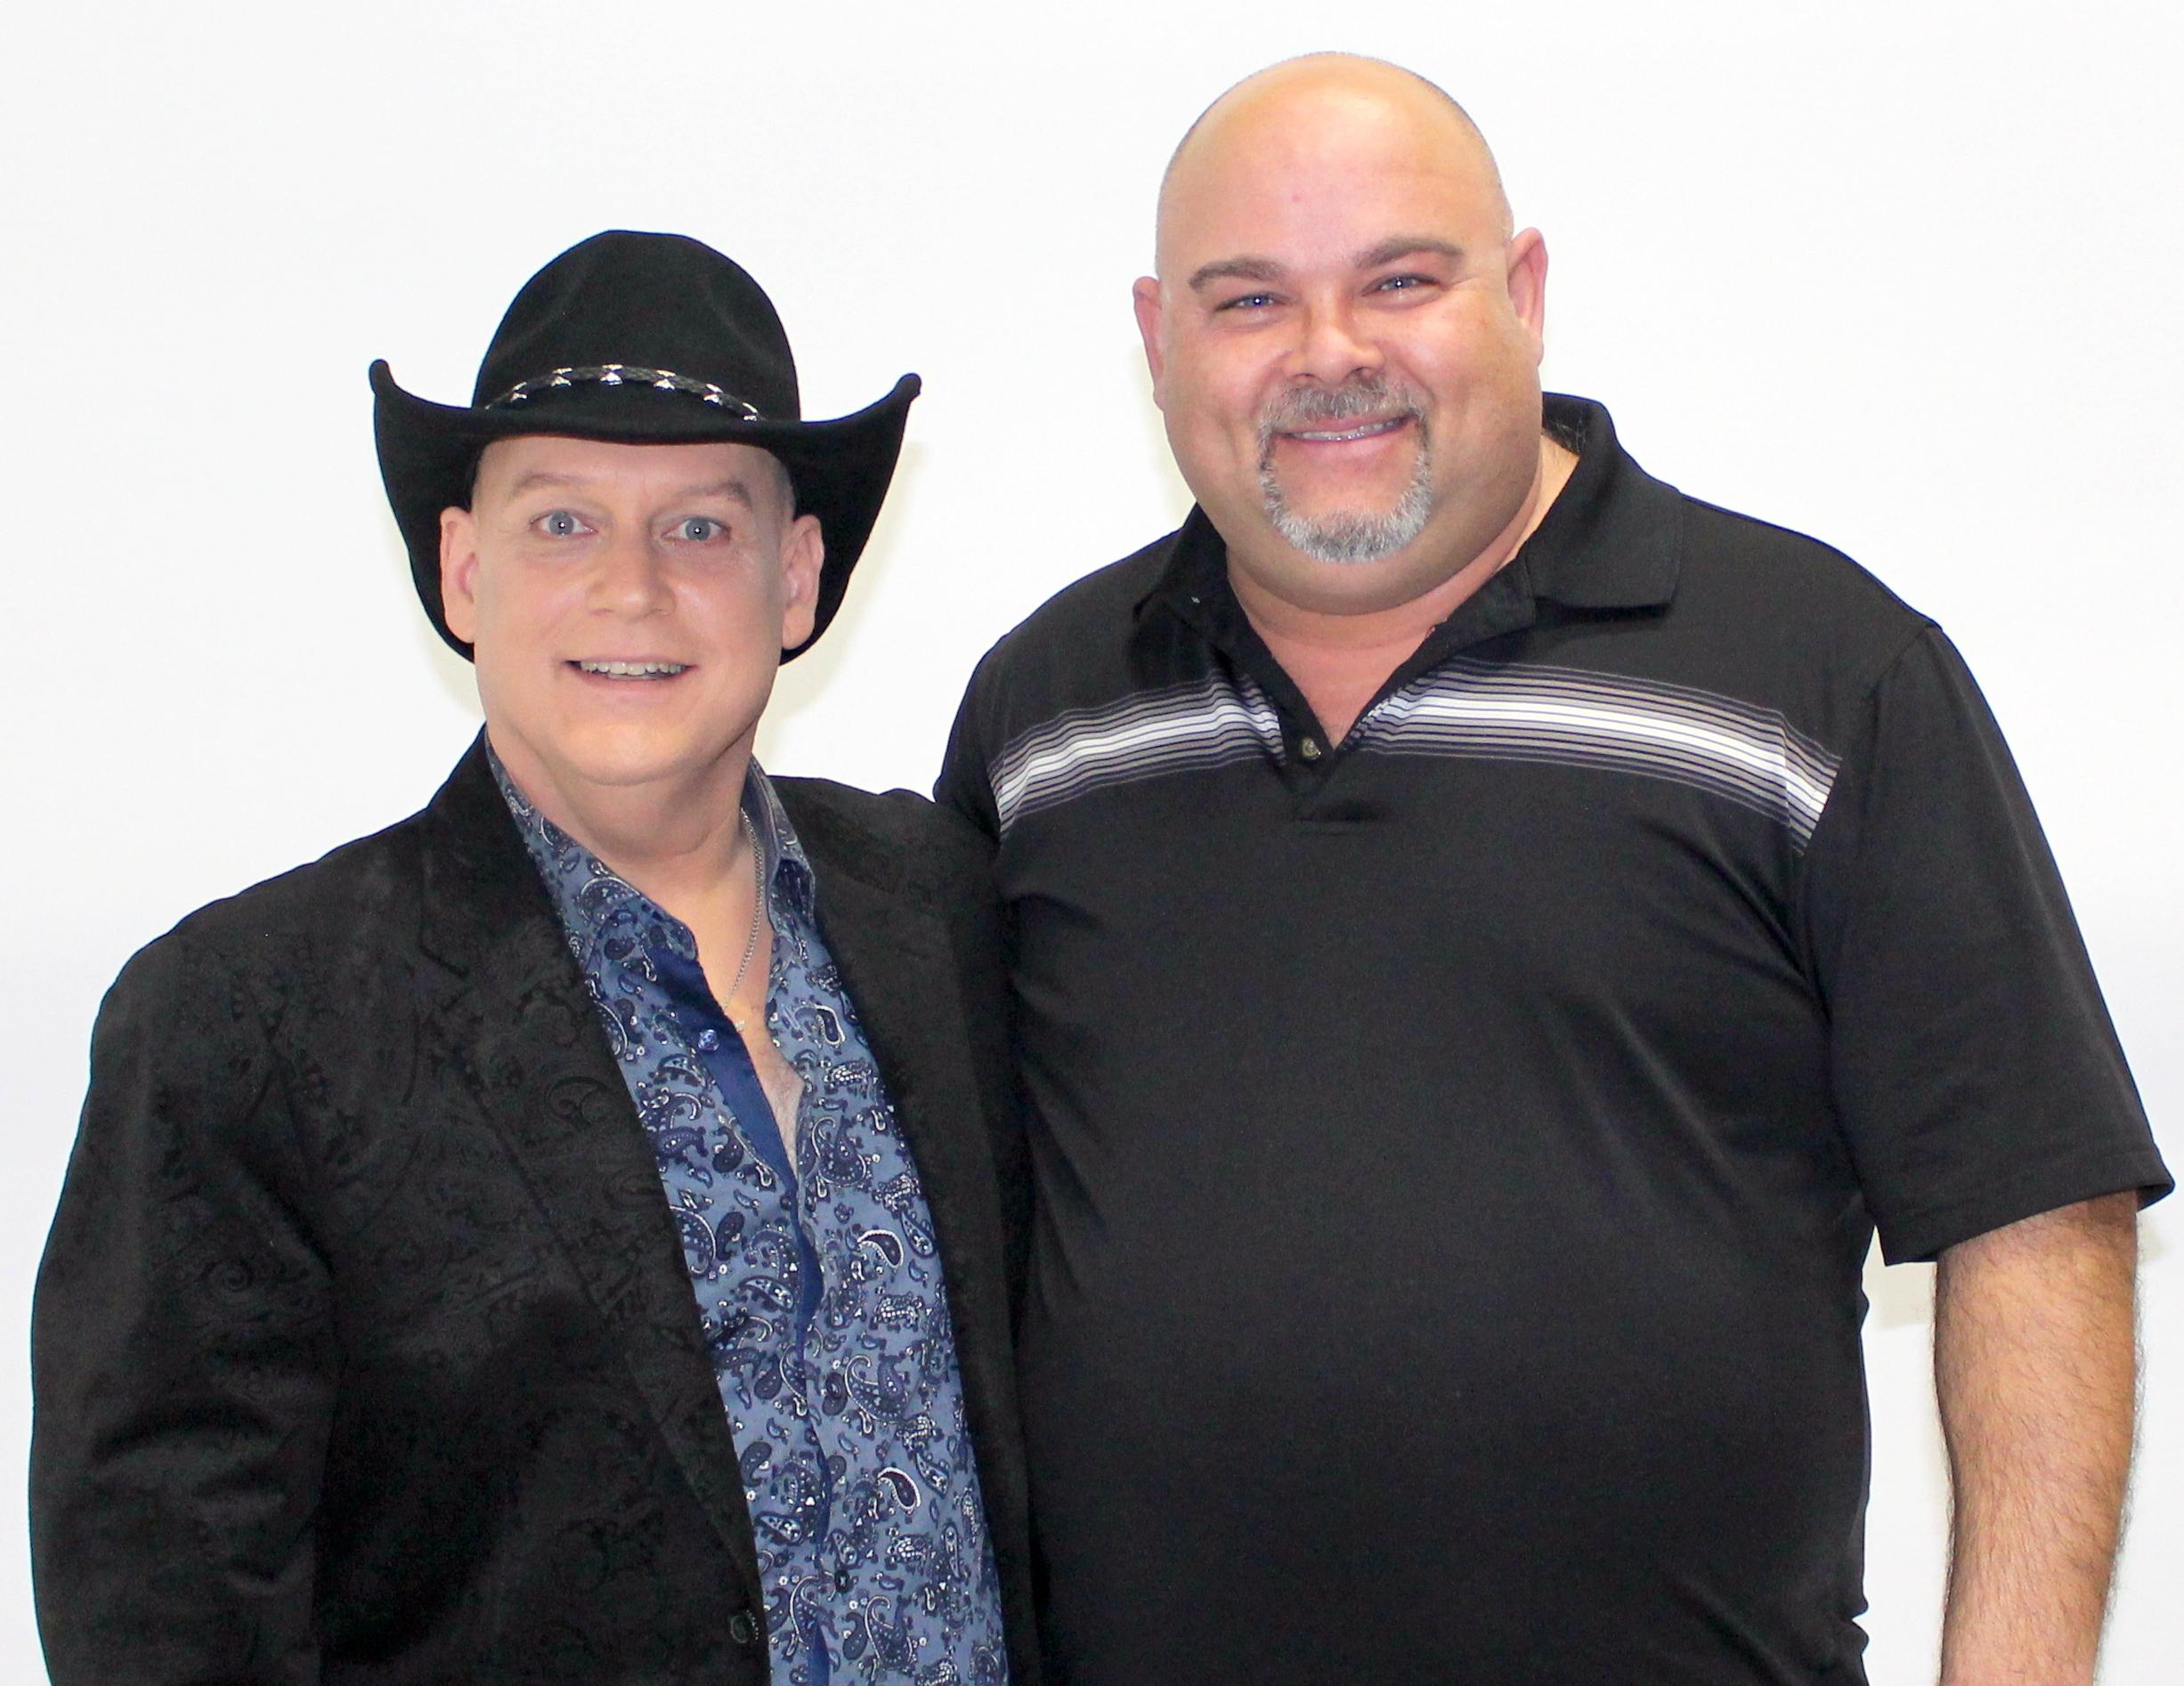 Phil Denault & Guy Marcoux